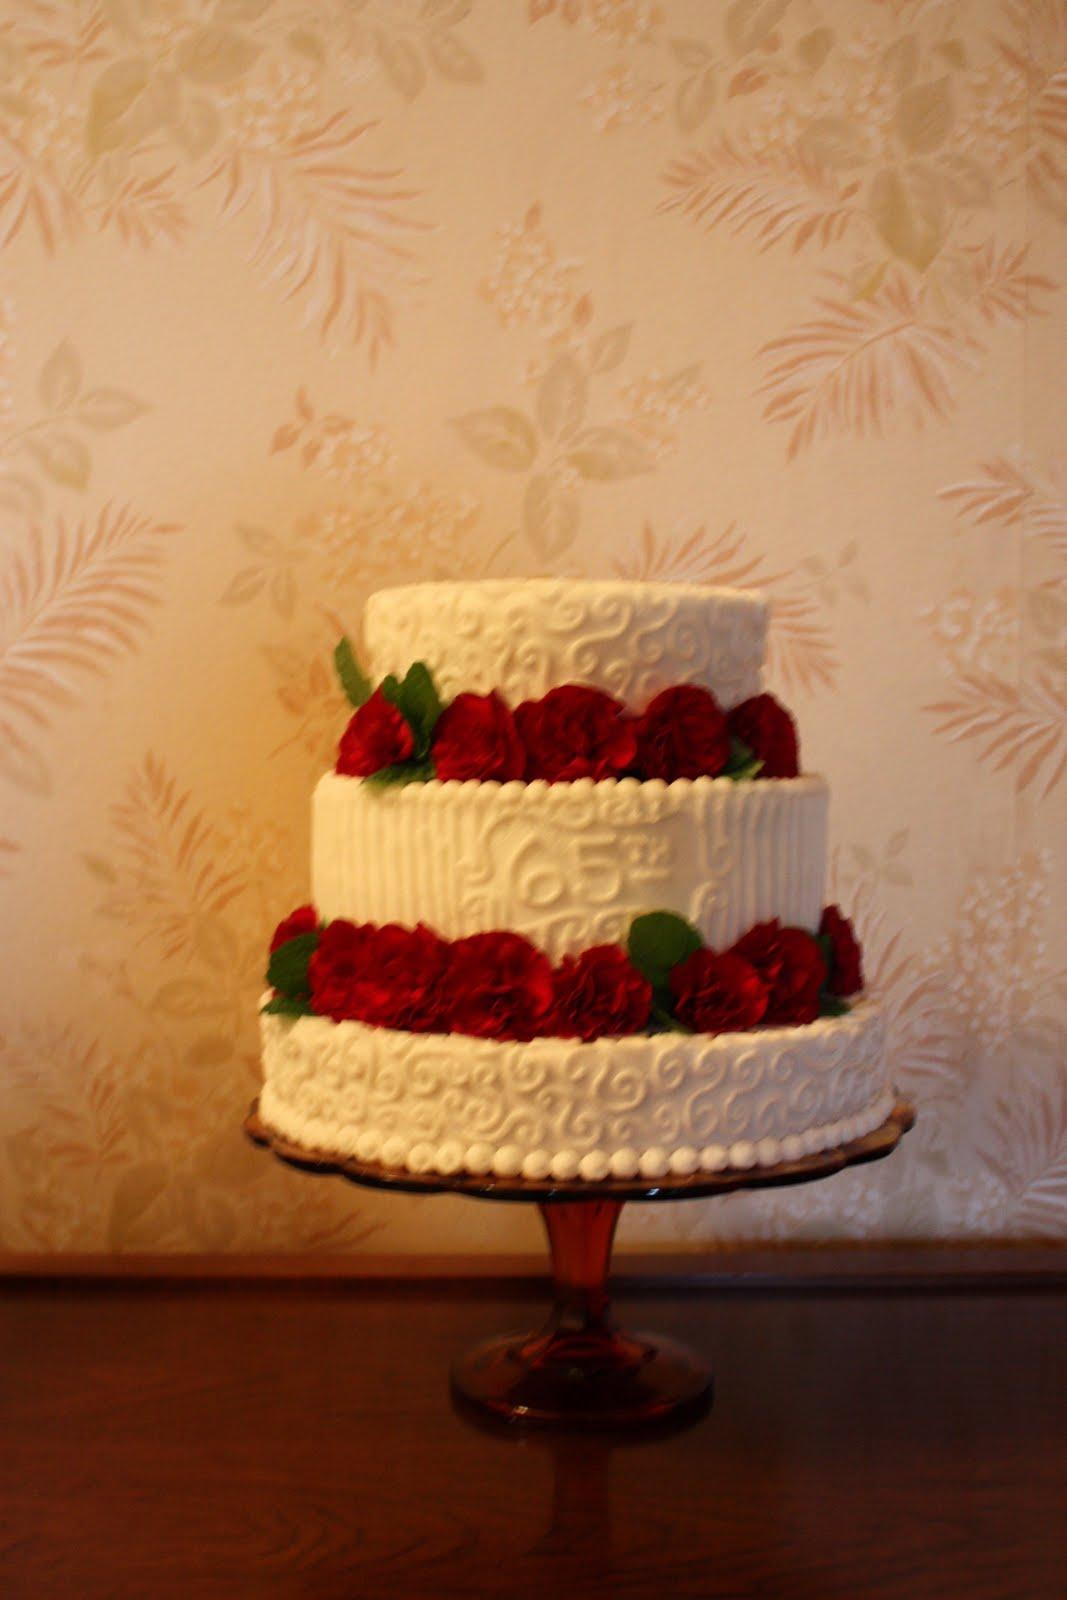 65 wedding anniversary cakes